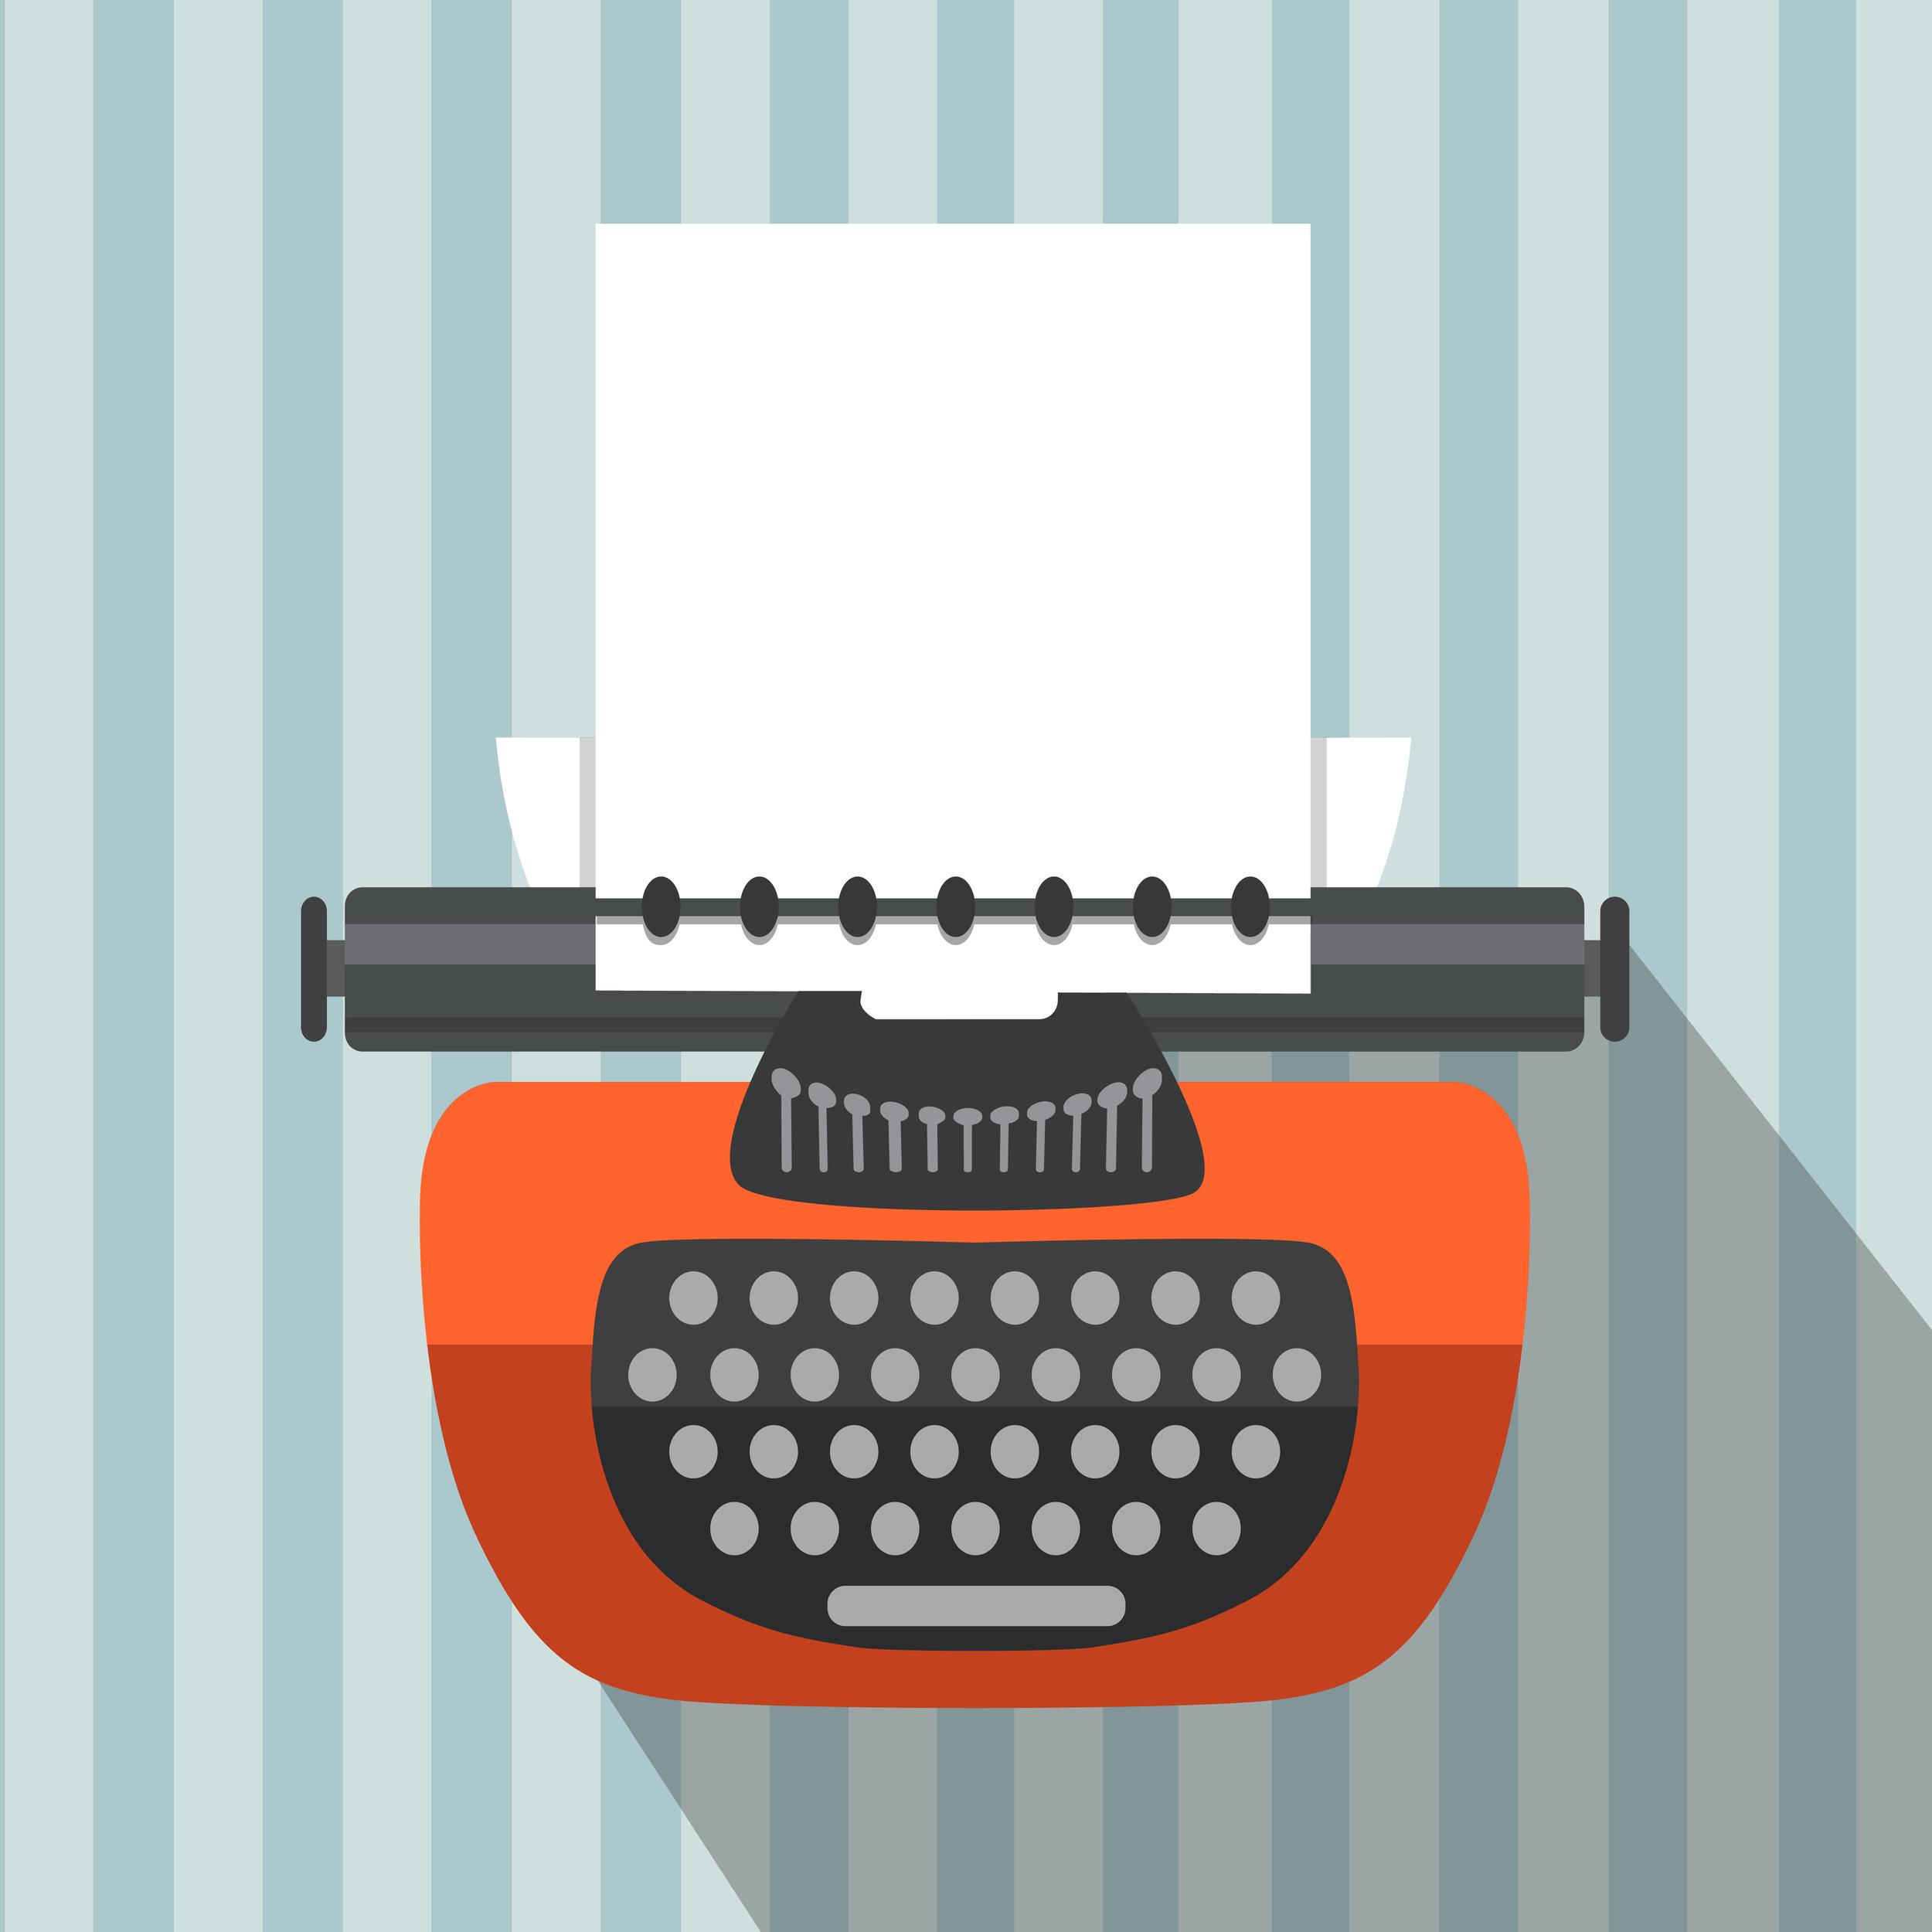 Graphic image of a typewriter